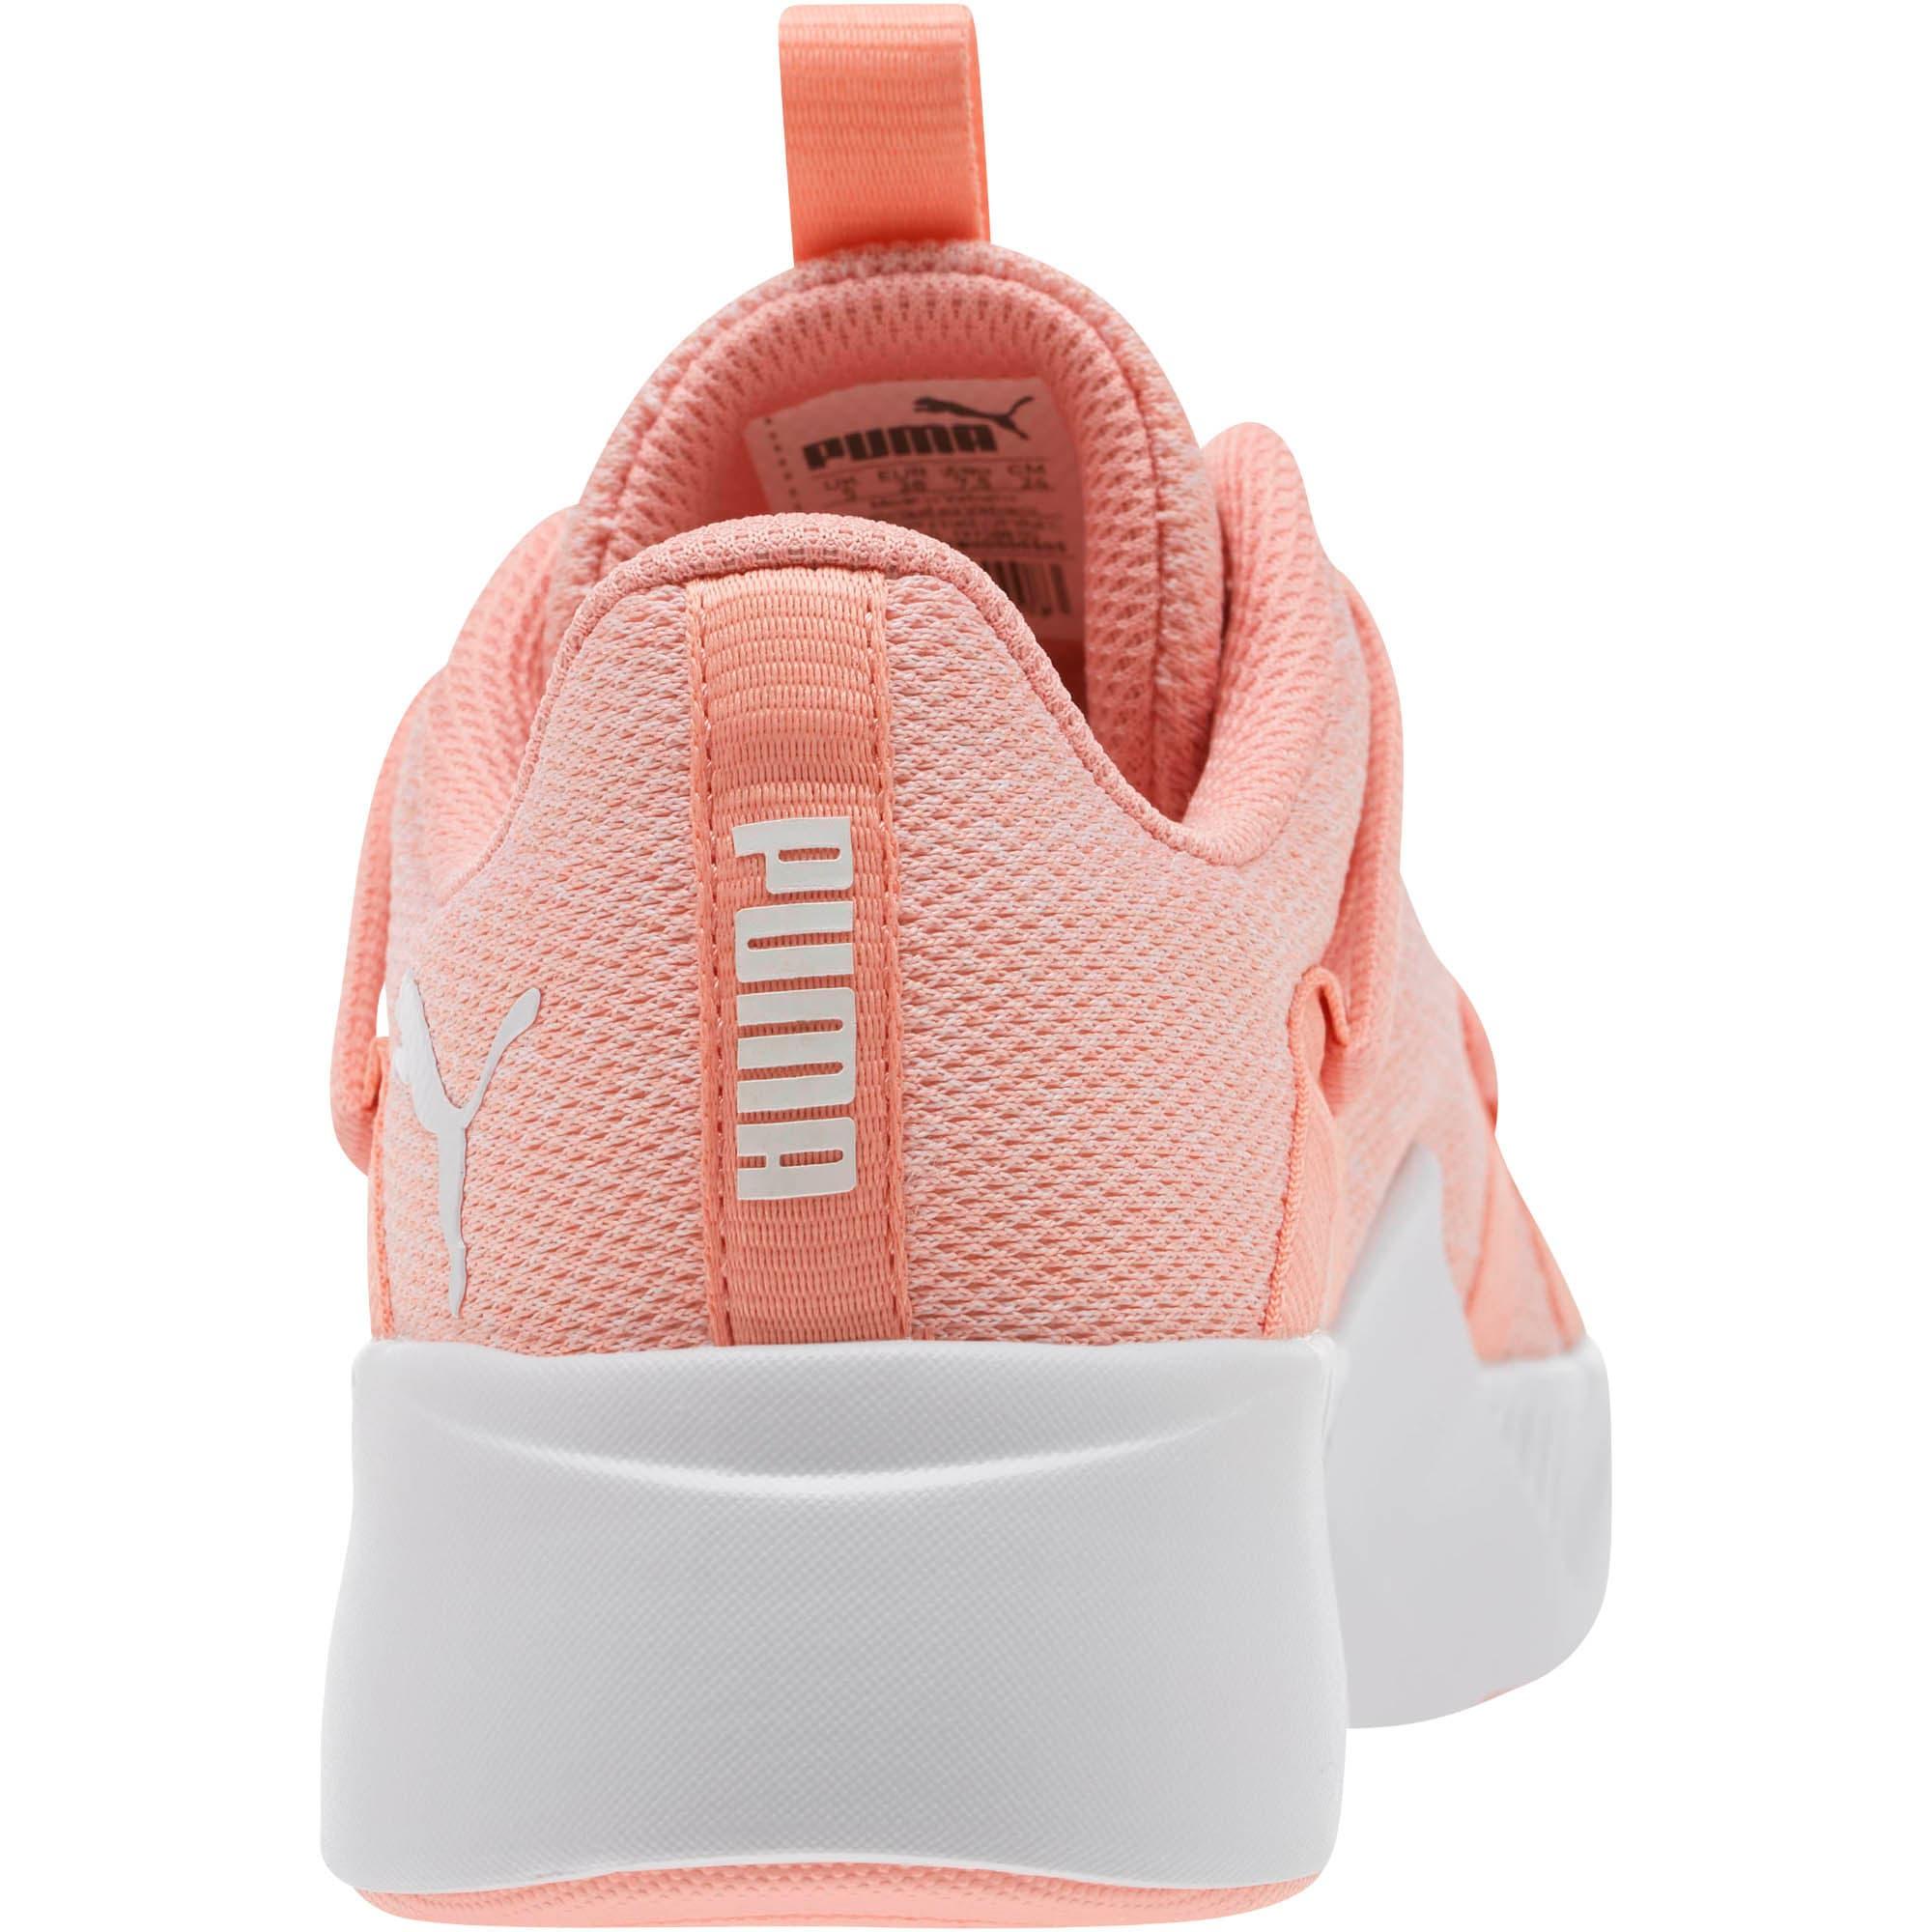 Thumbnail 4 of Incite Knit Women's Training Shoes, Peach Bud-Puma White, medium